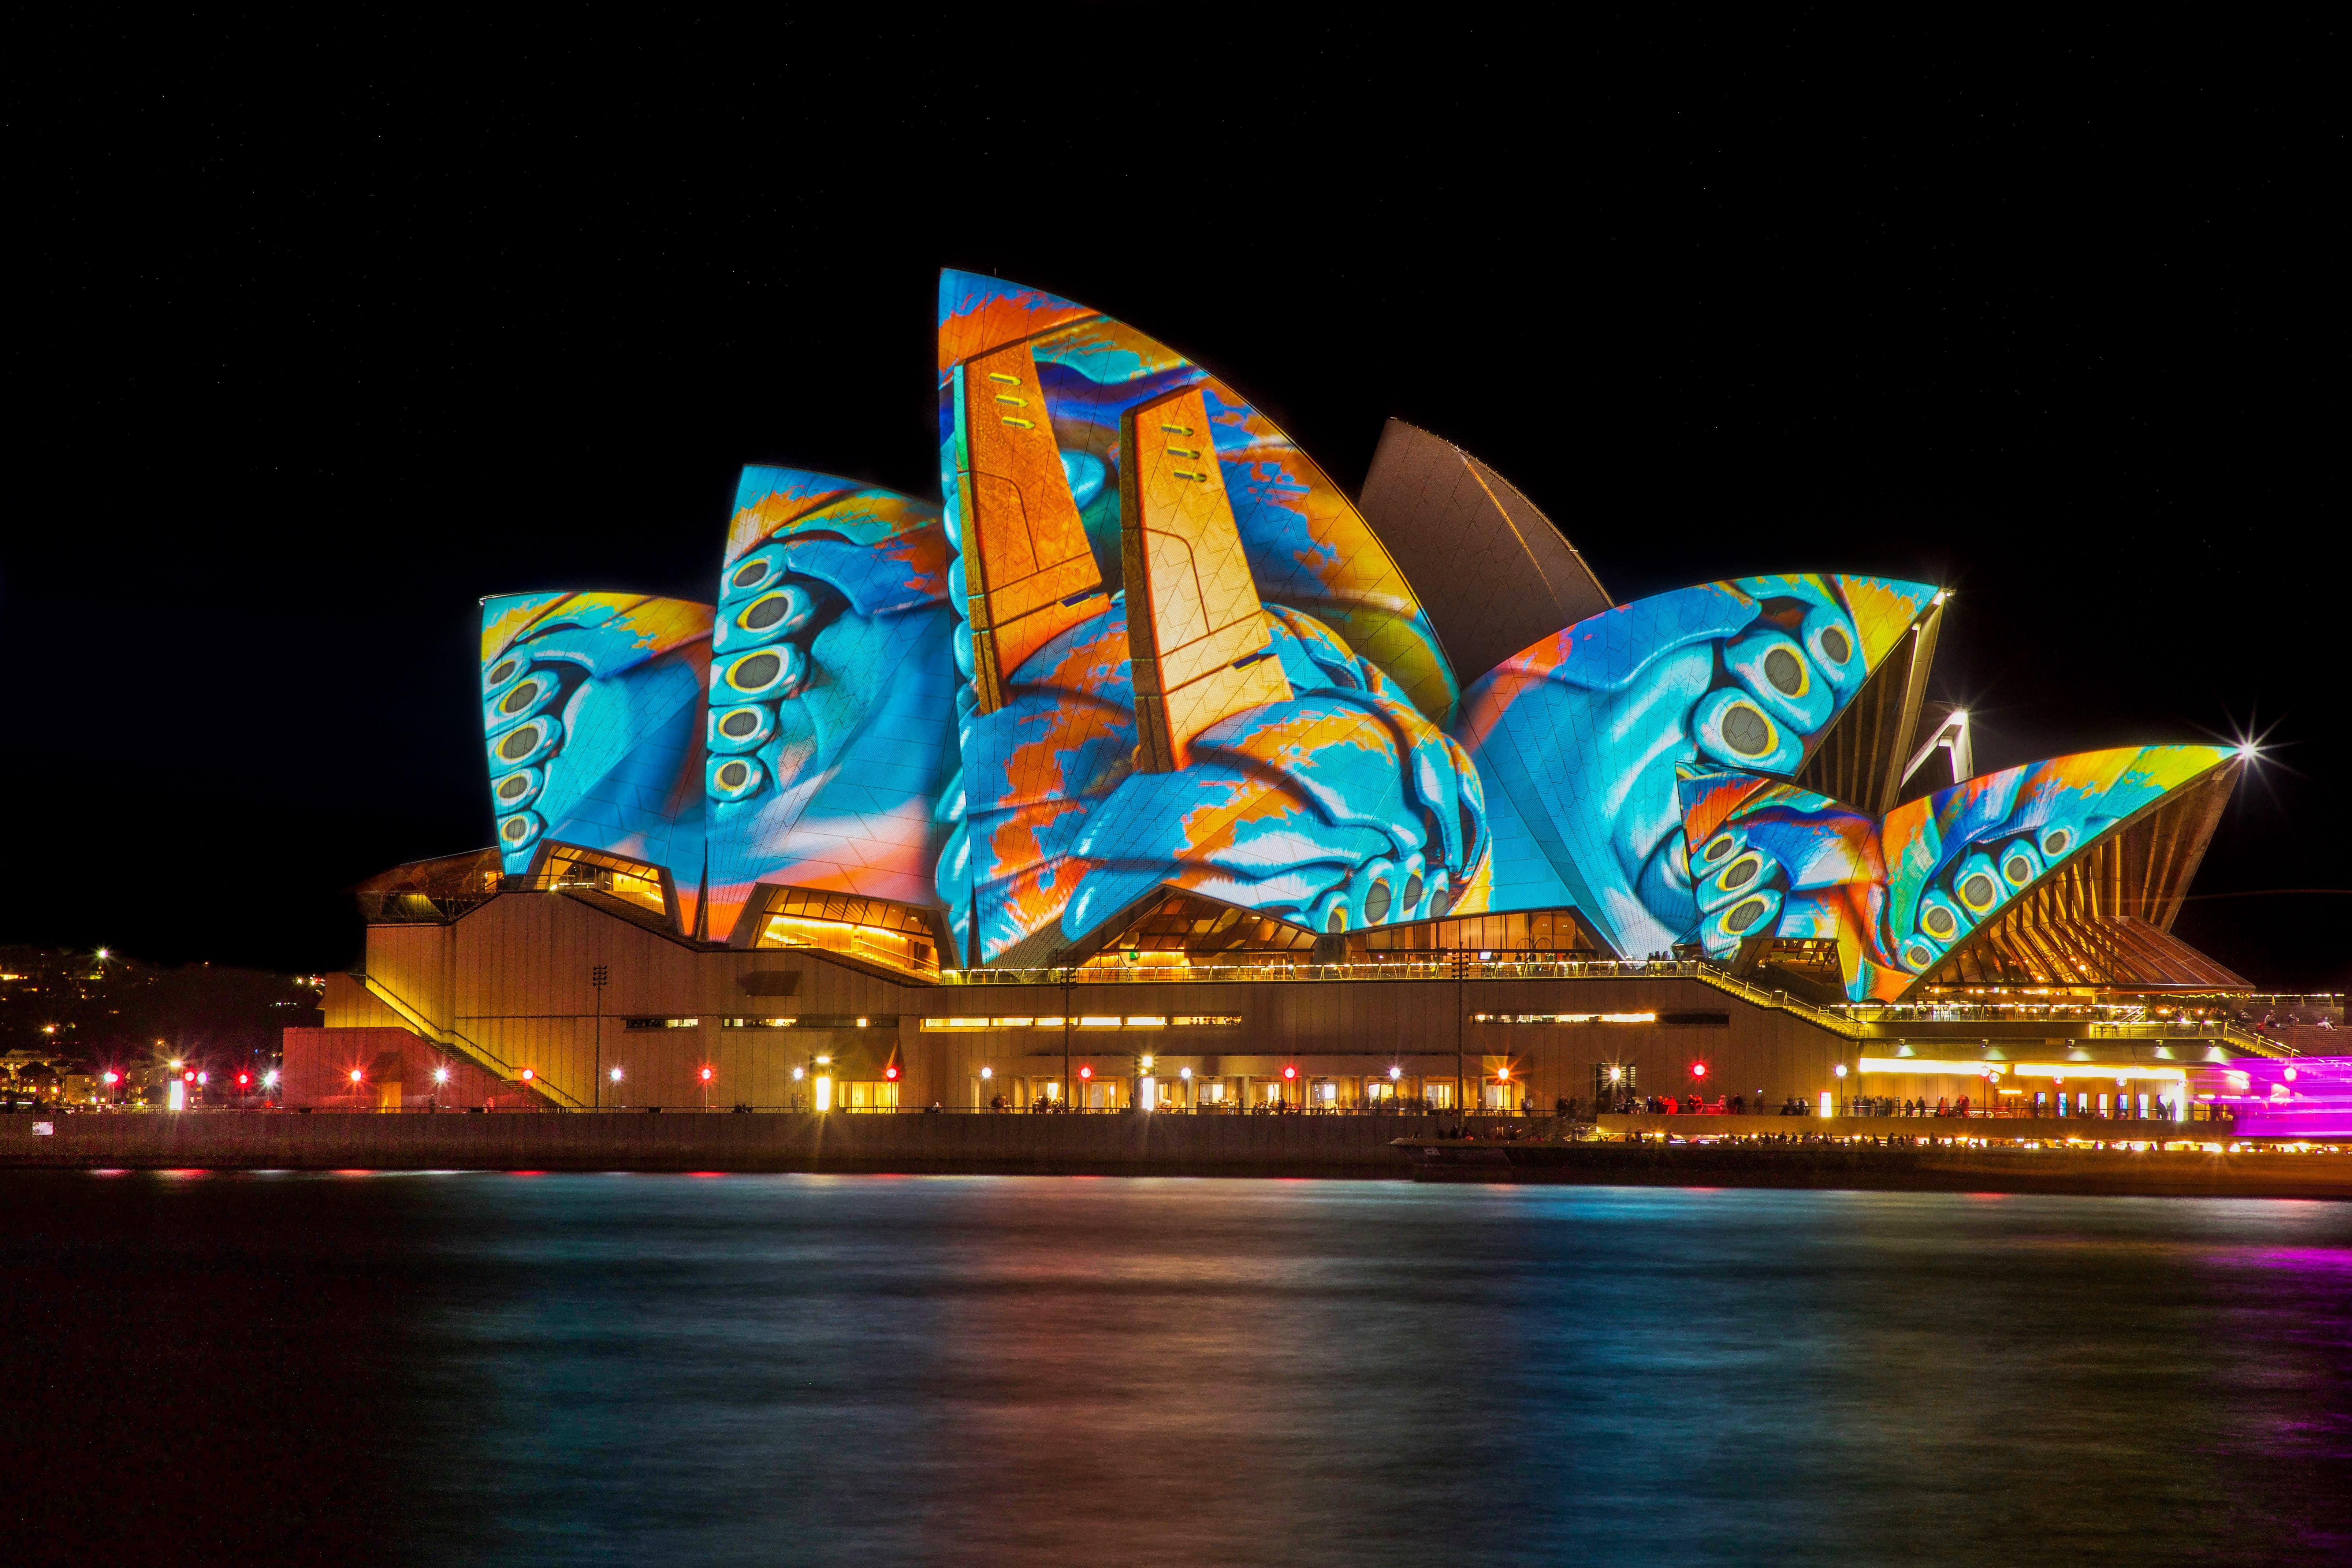 Treble-digit affiliate growth showcases Australian ecommerce